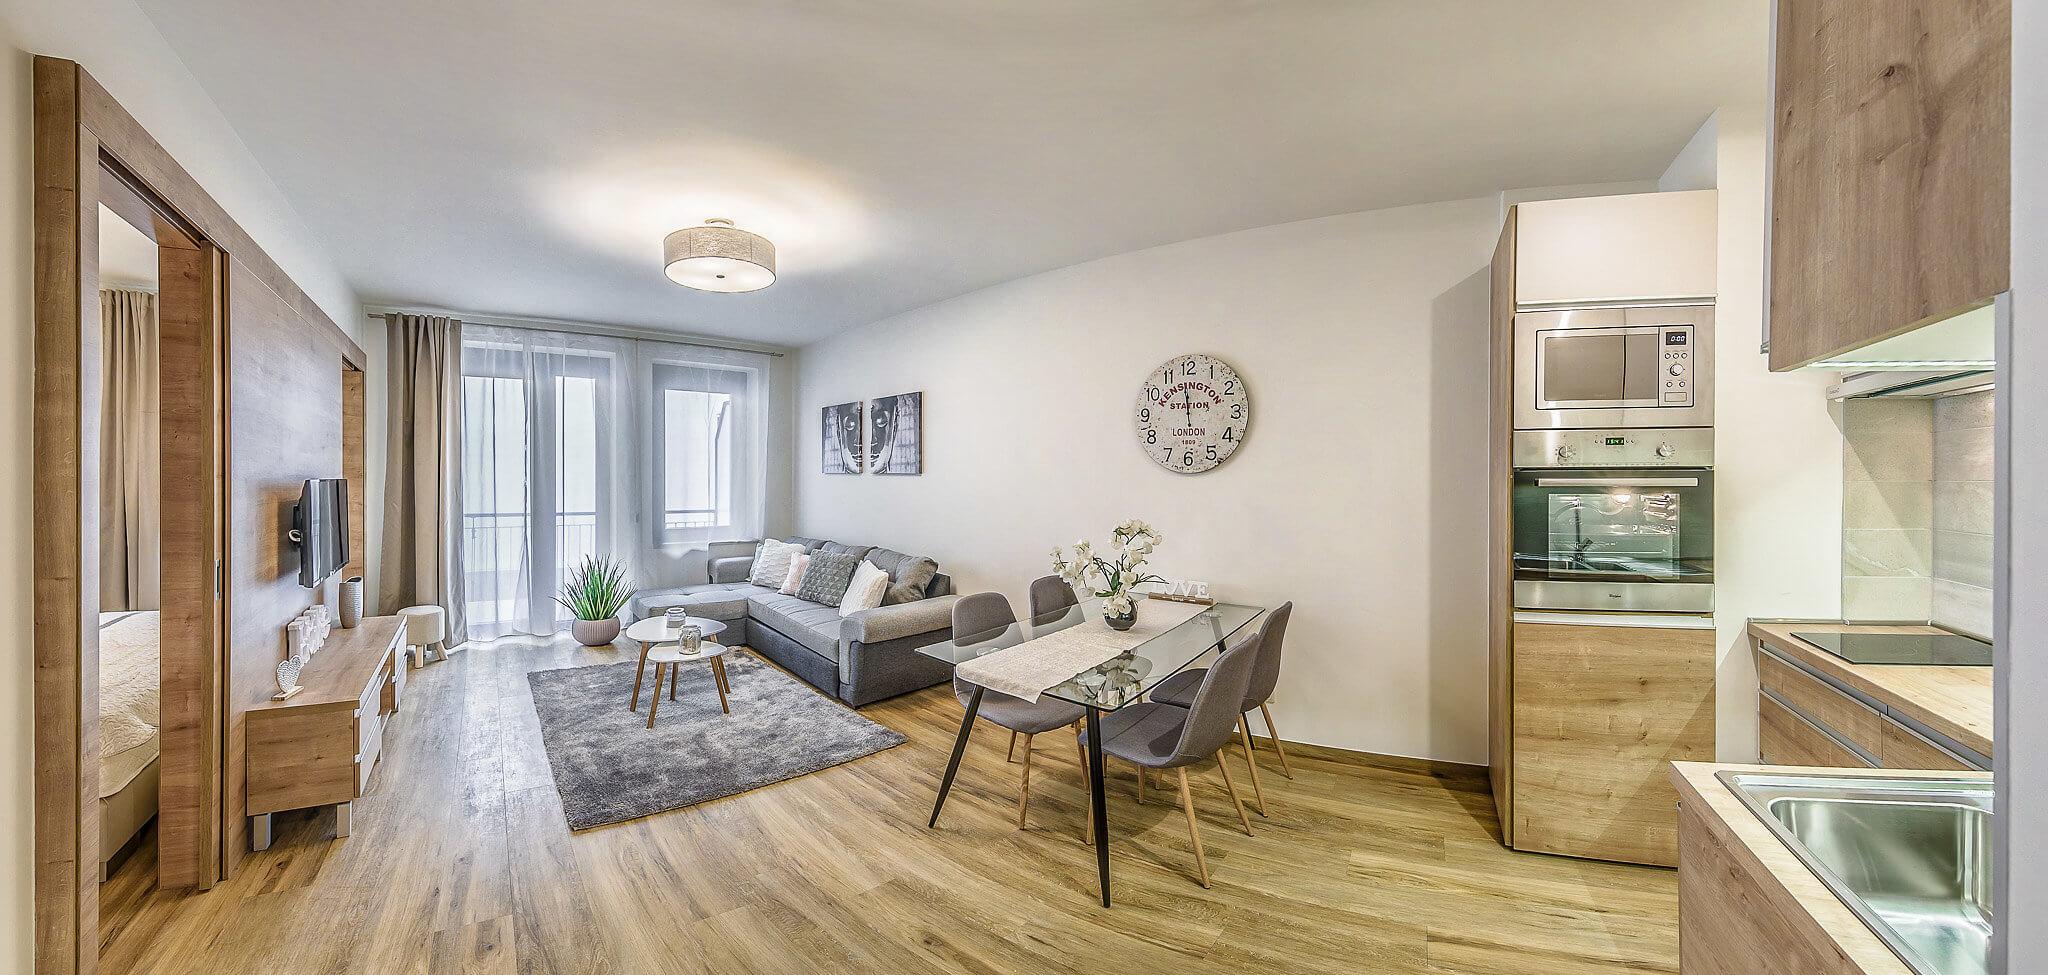 One bedroom Standard 2 - Art Homes Budapest